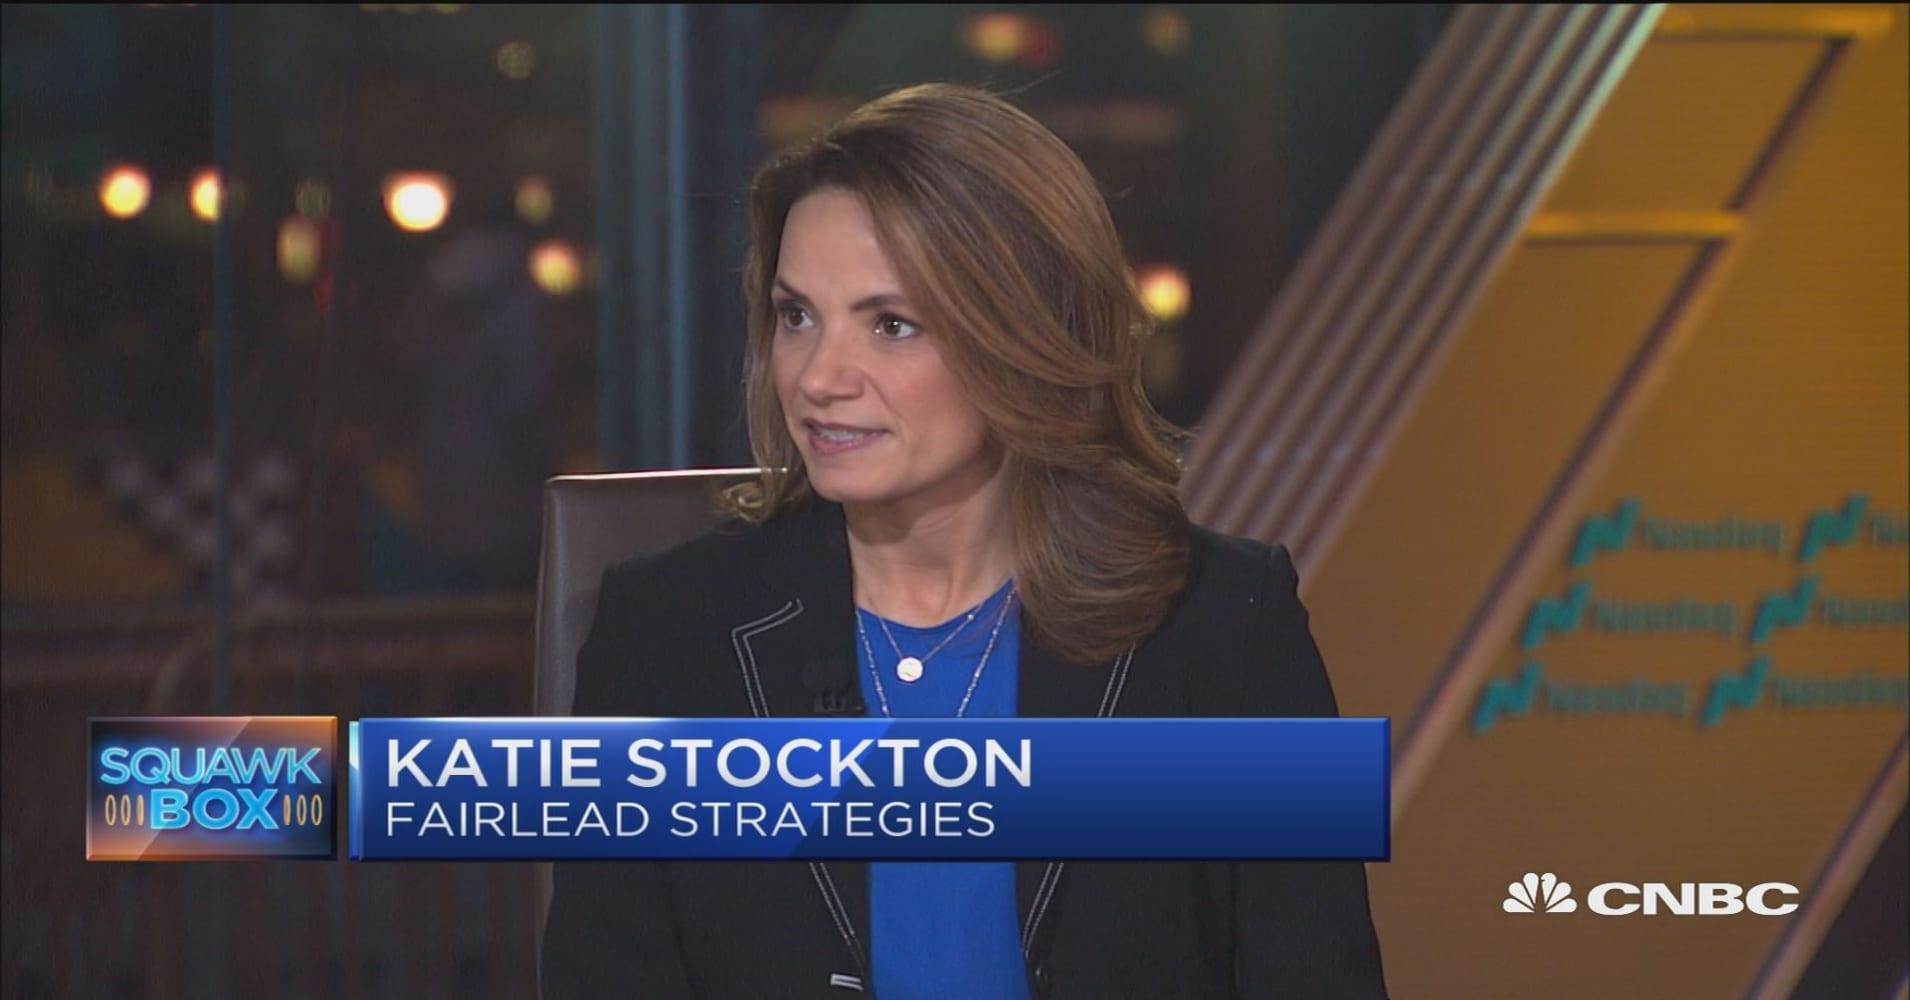 Chart analyst Katie Stockton sees a 'minimum' 2 to 3 week stock pullback